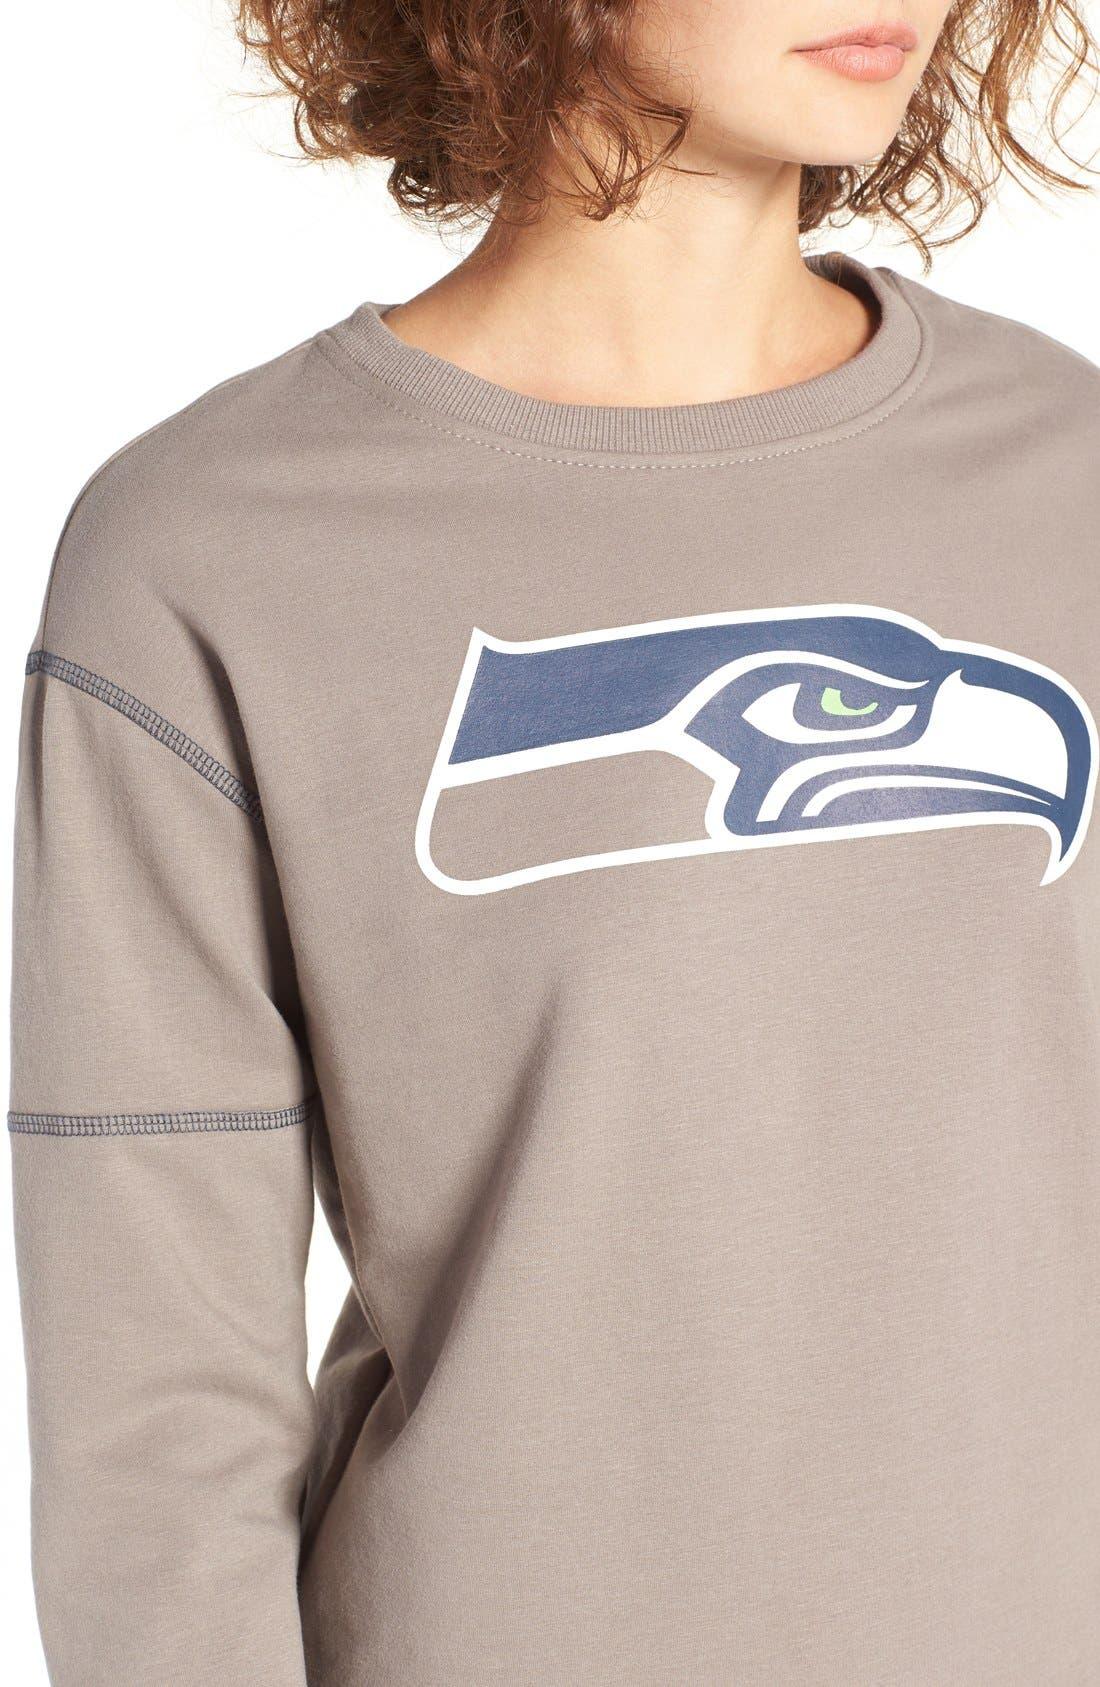 Alternate Image 4  - '47 'Seattle Seahawks' Graphic Sweatshirt